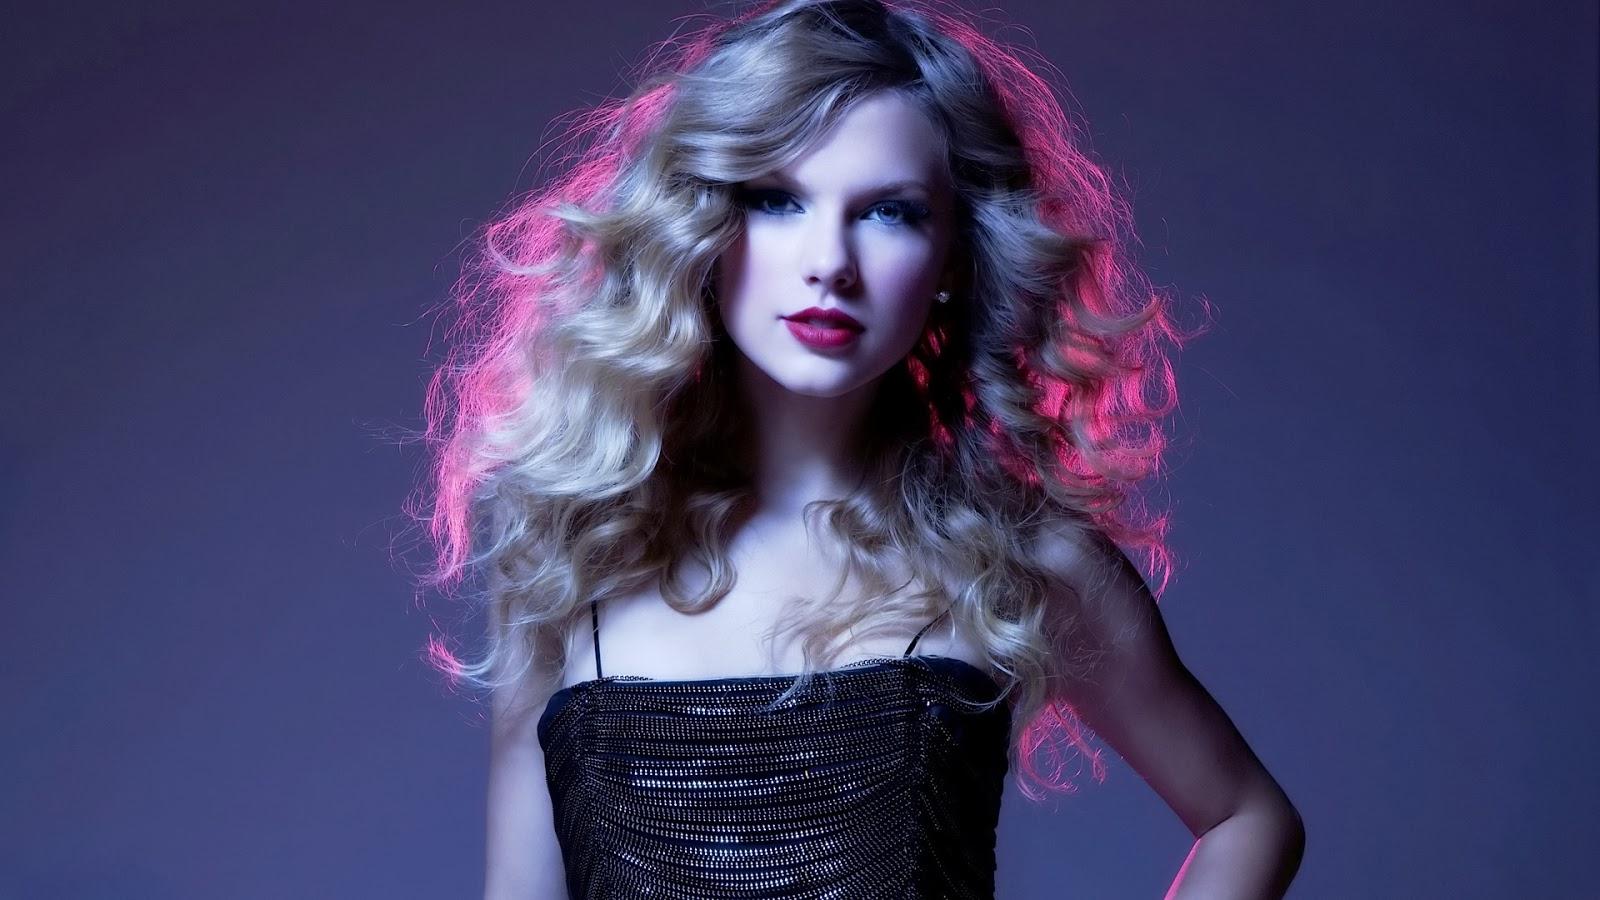 Taylor Swift Barbie Doll HD Wallpaper